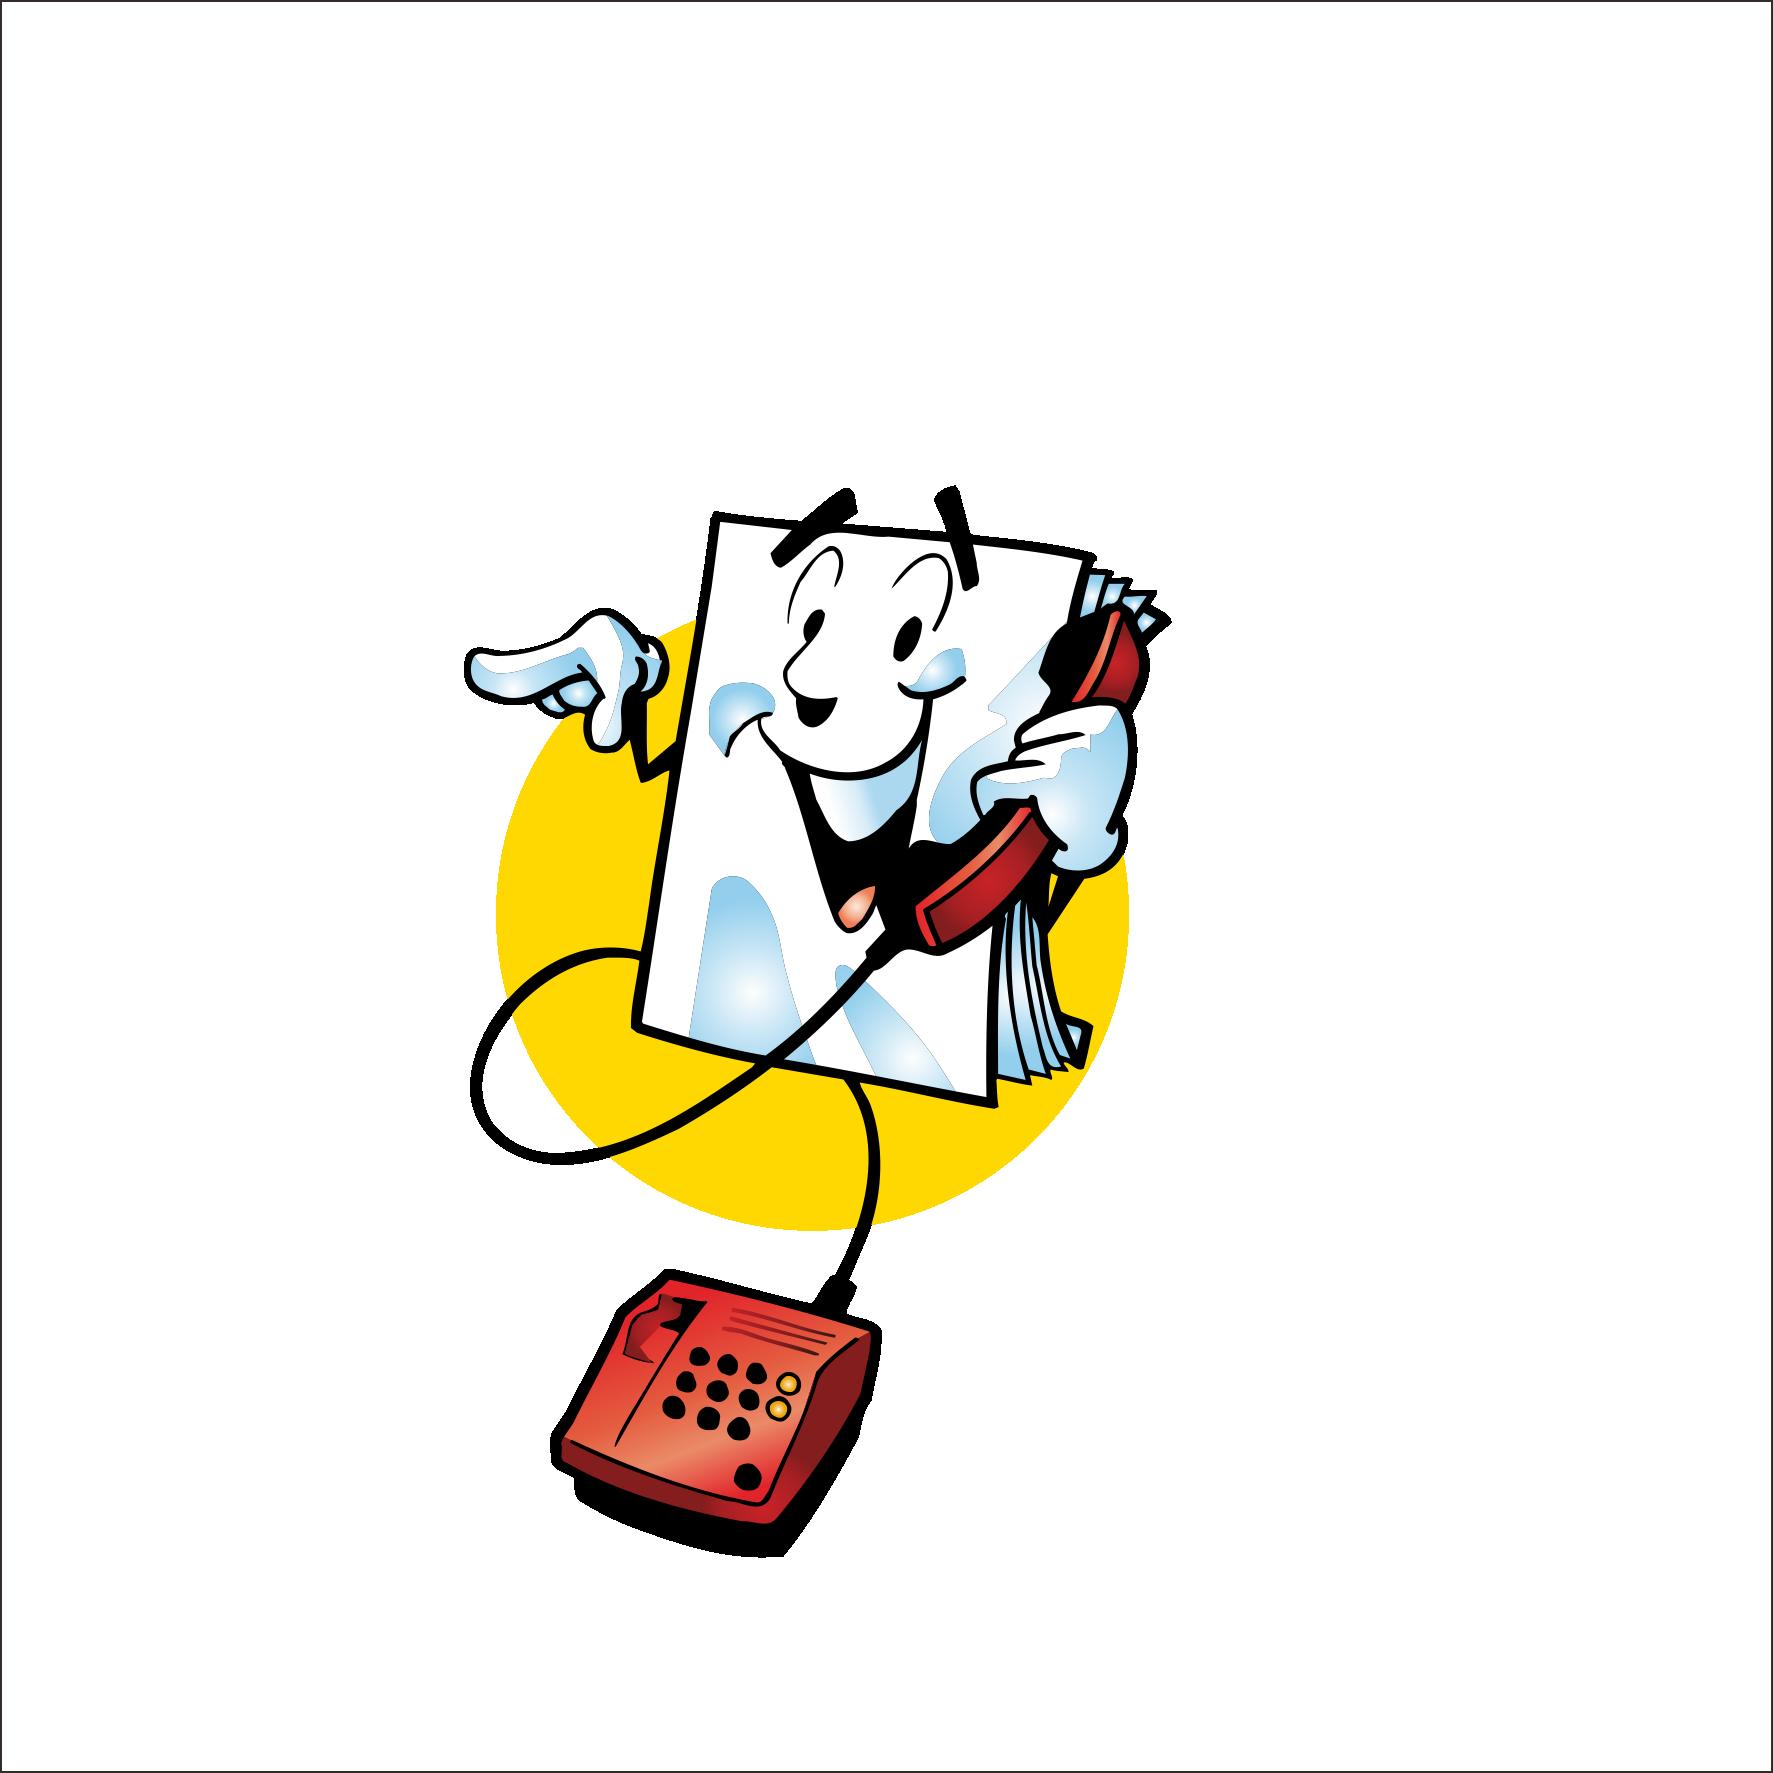 Telephone clipart hotline. Booth cartoon moscowu washington